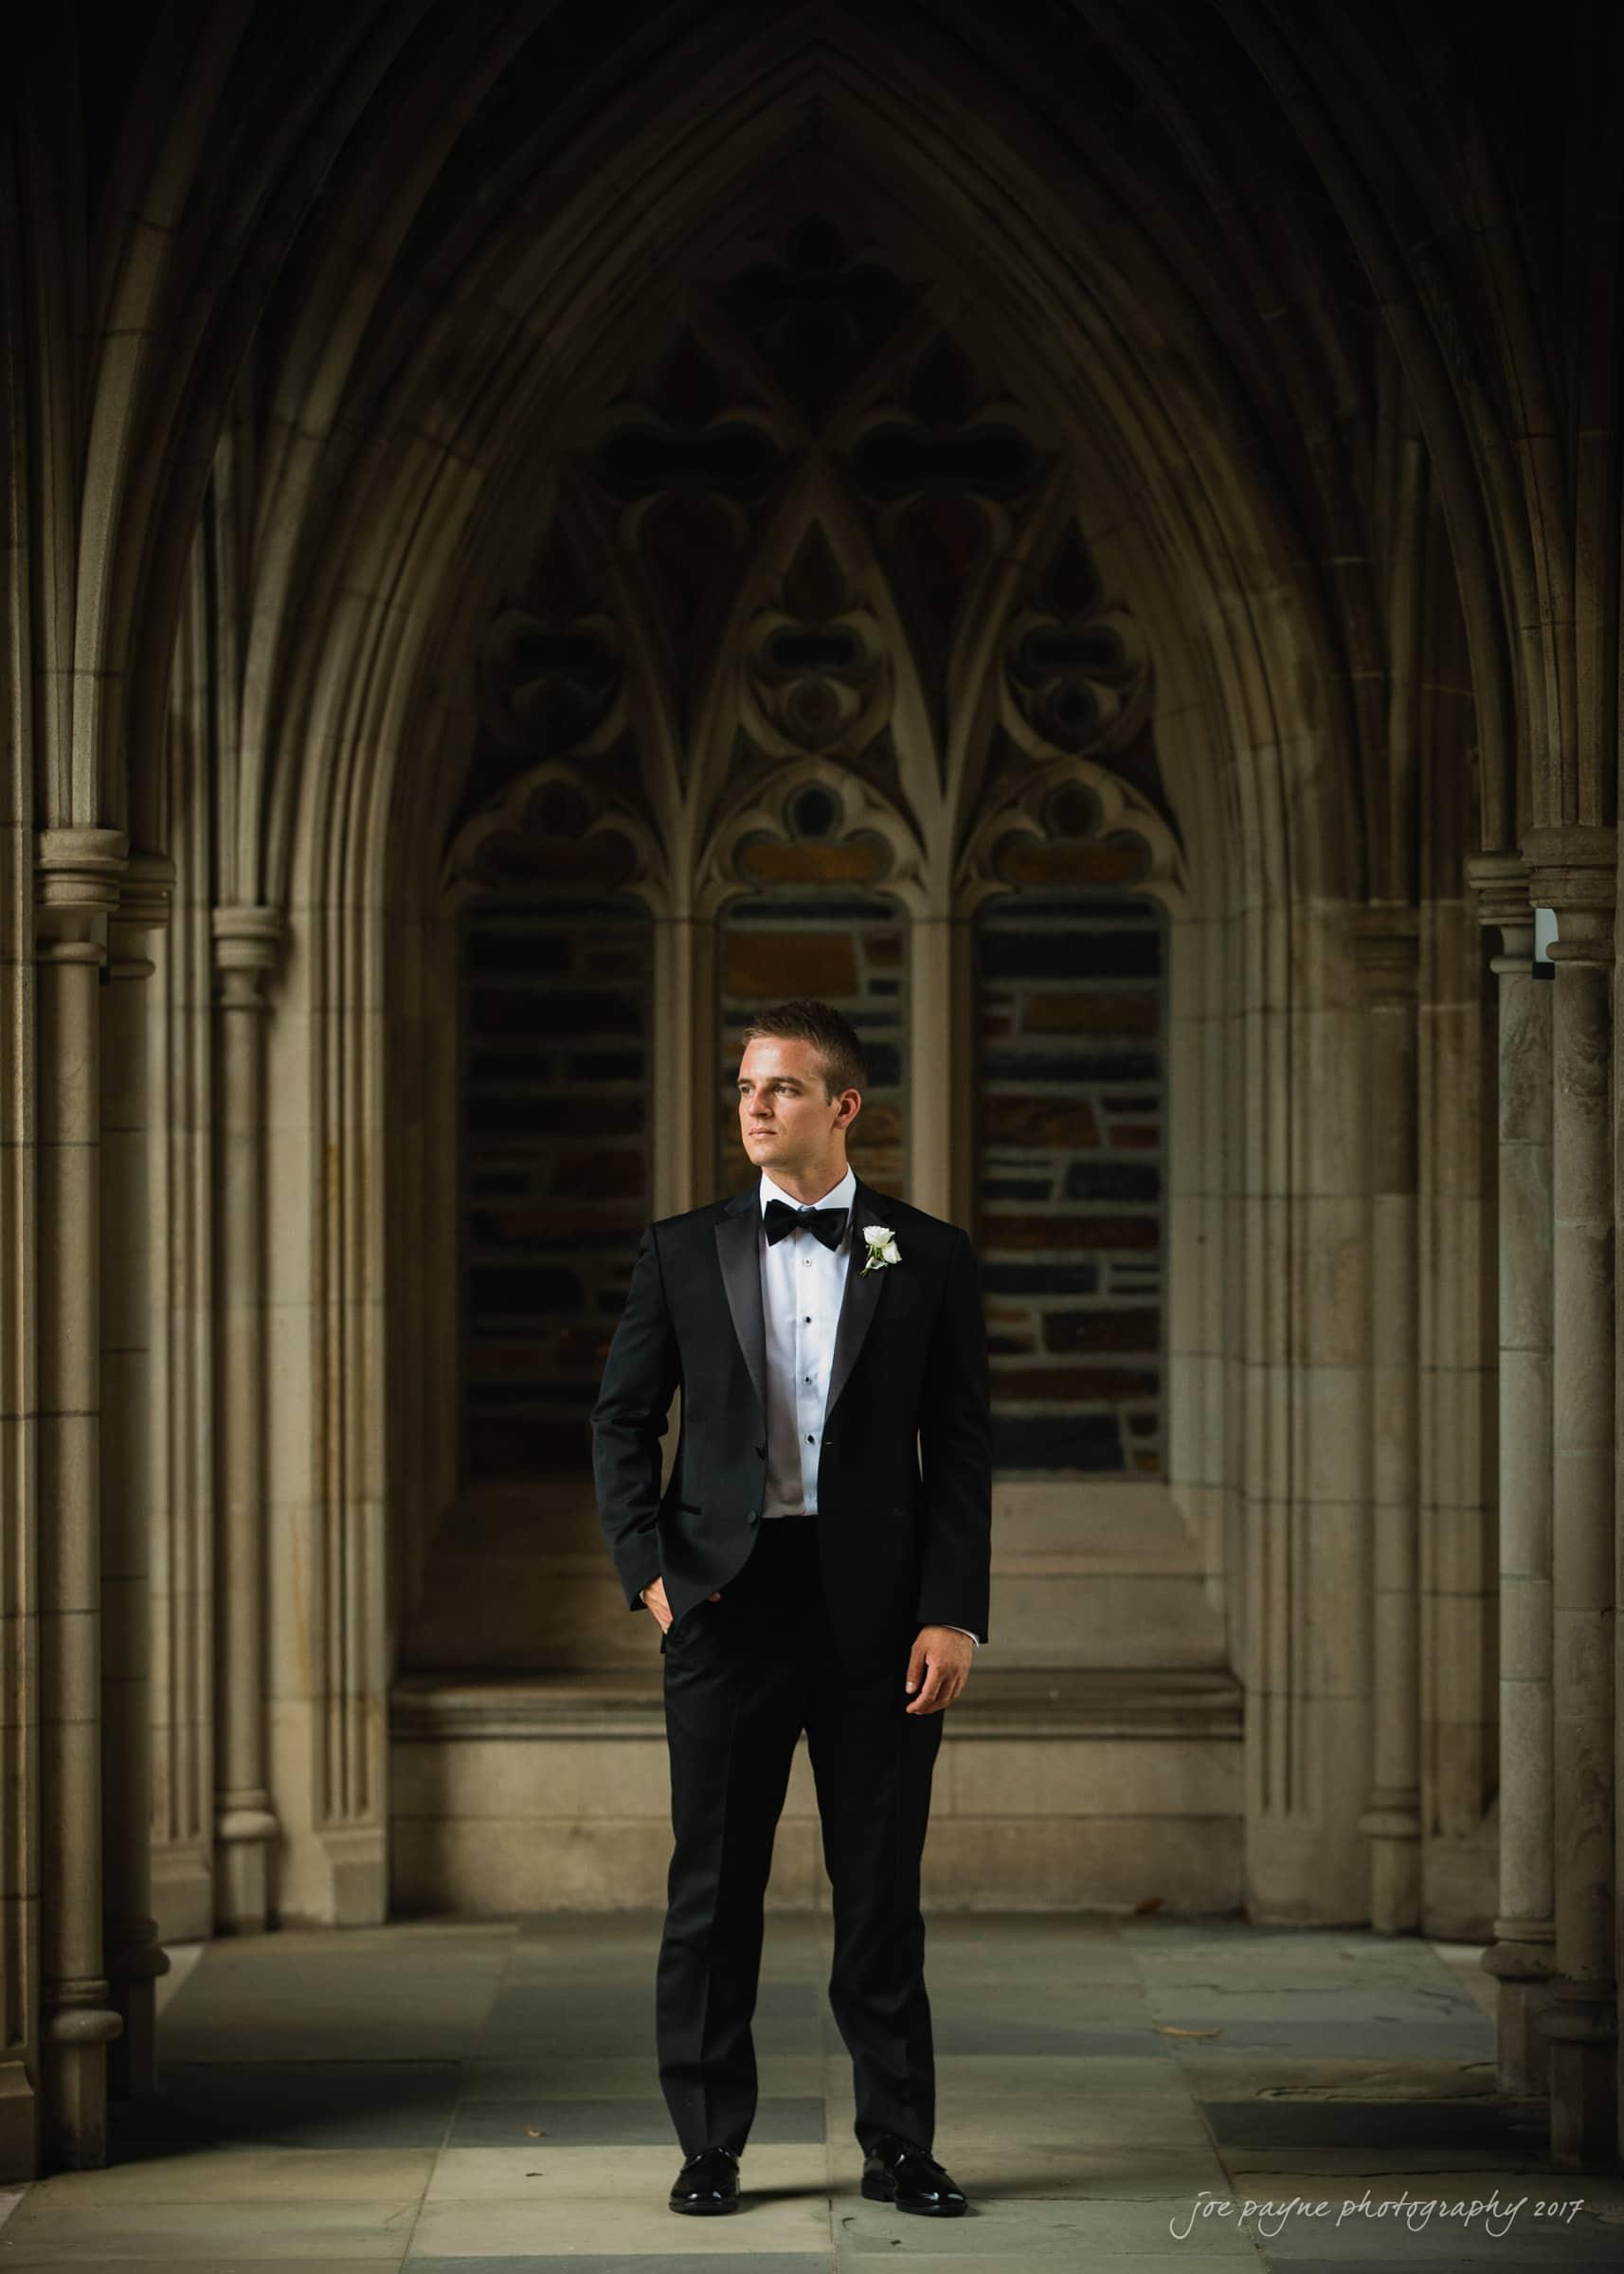 duke chapel weddings - groom in arcades